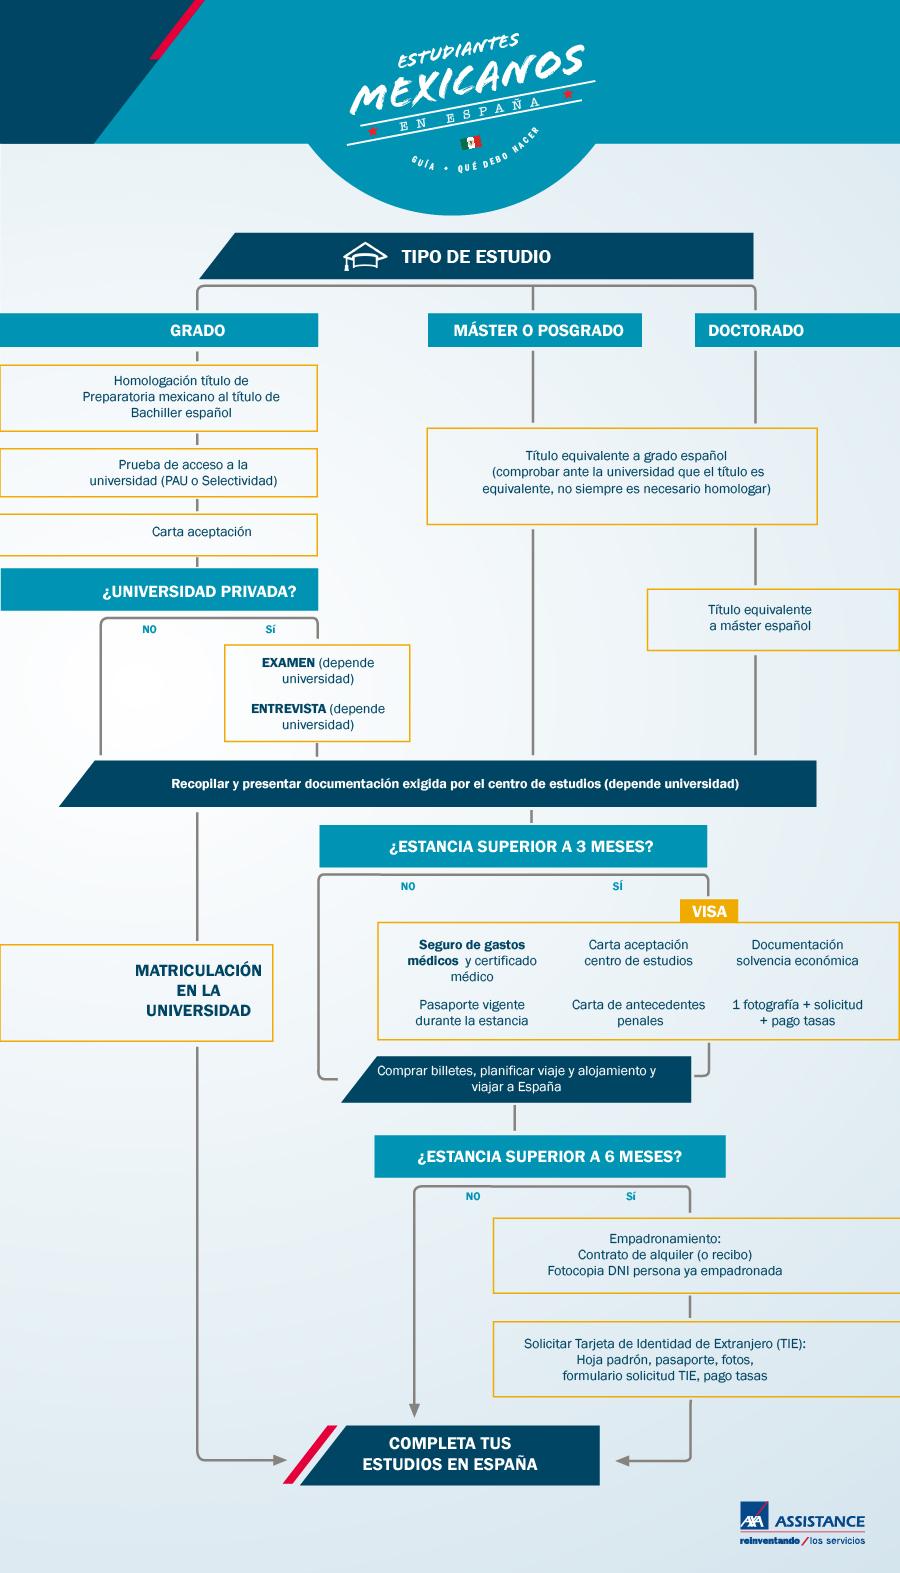 Infografia Estudiantes mexicanos en Espana - Guia AXA Assistance ene 16